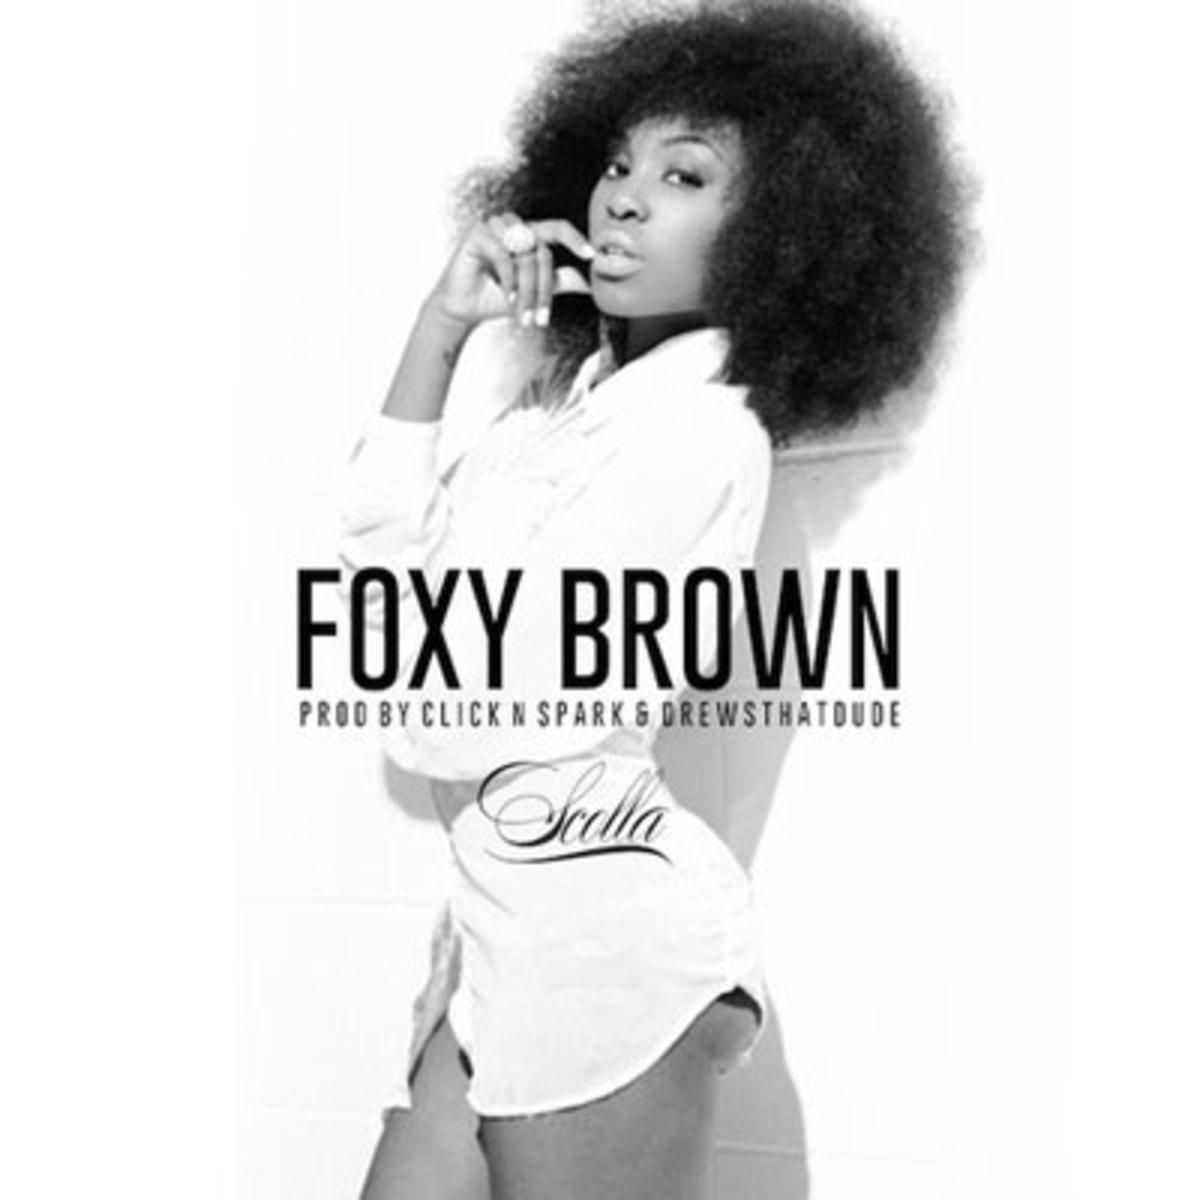 scolla-foxybrown.jpg